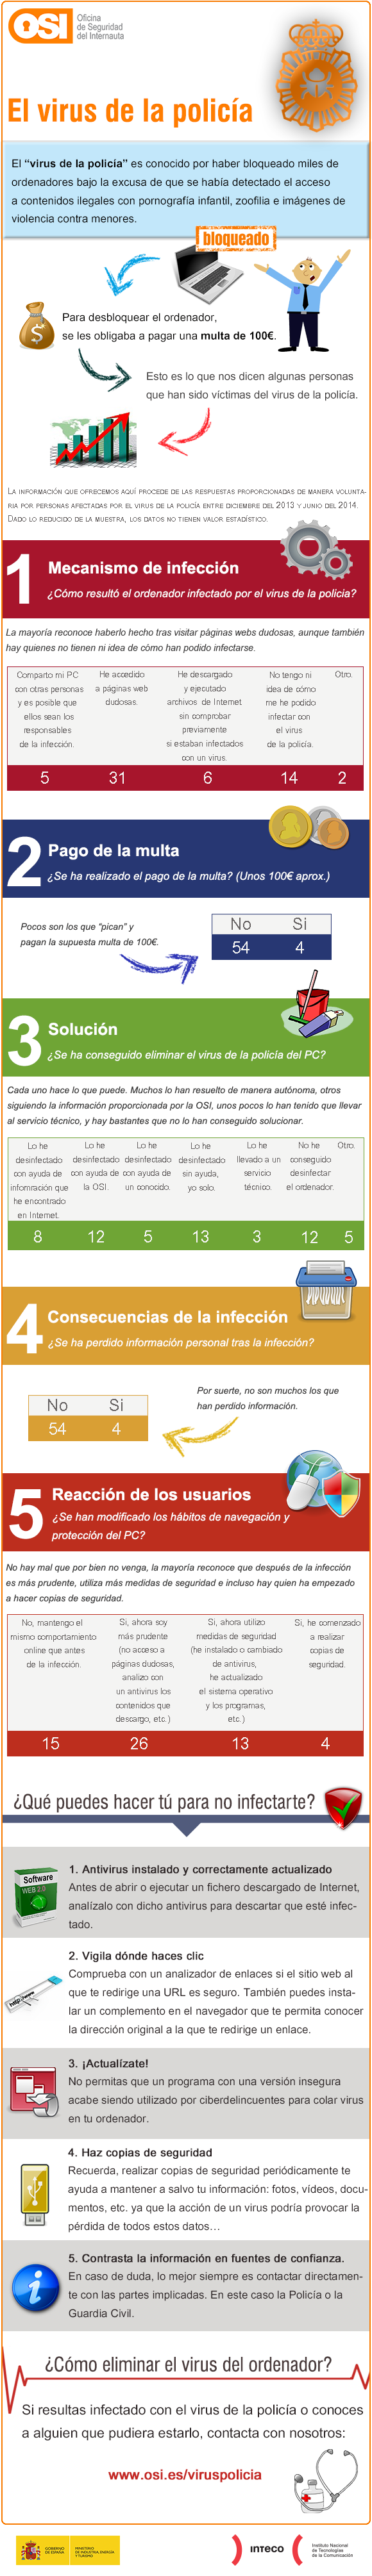 infografia-virus-poli